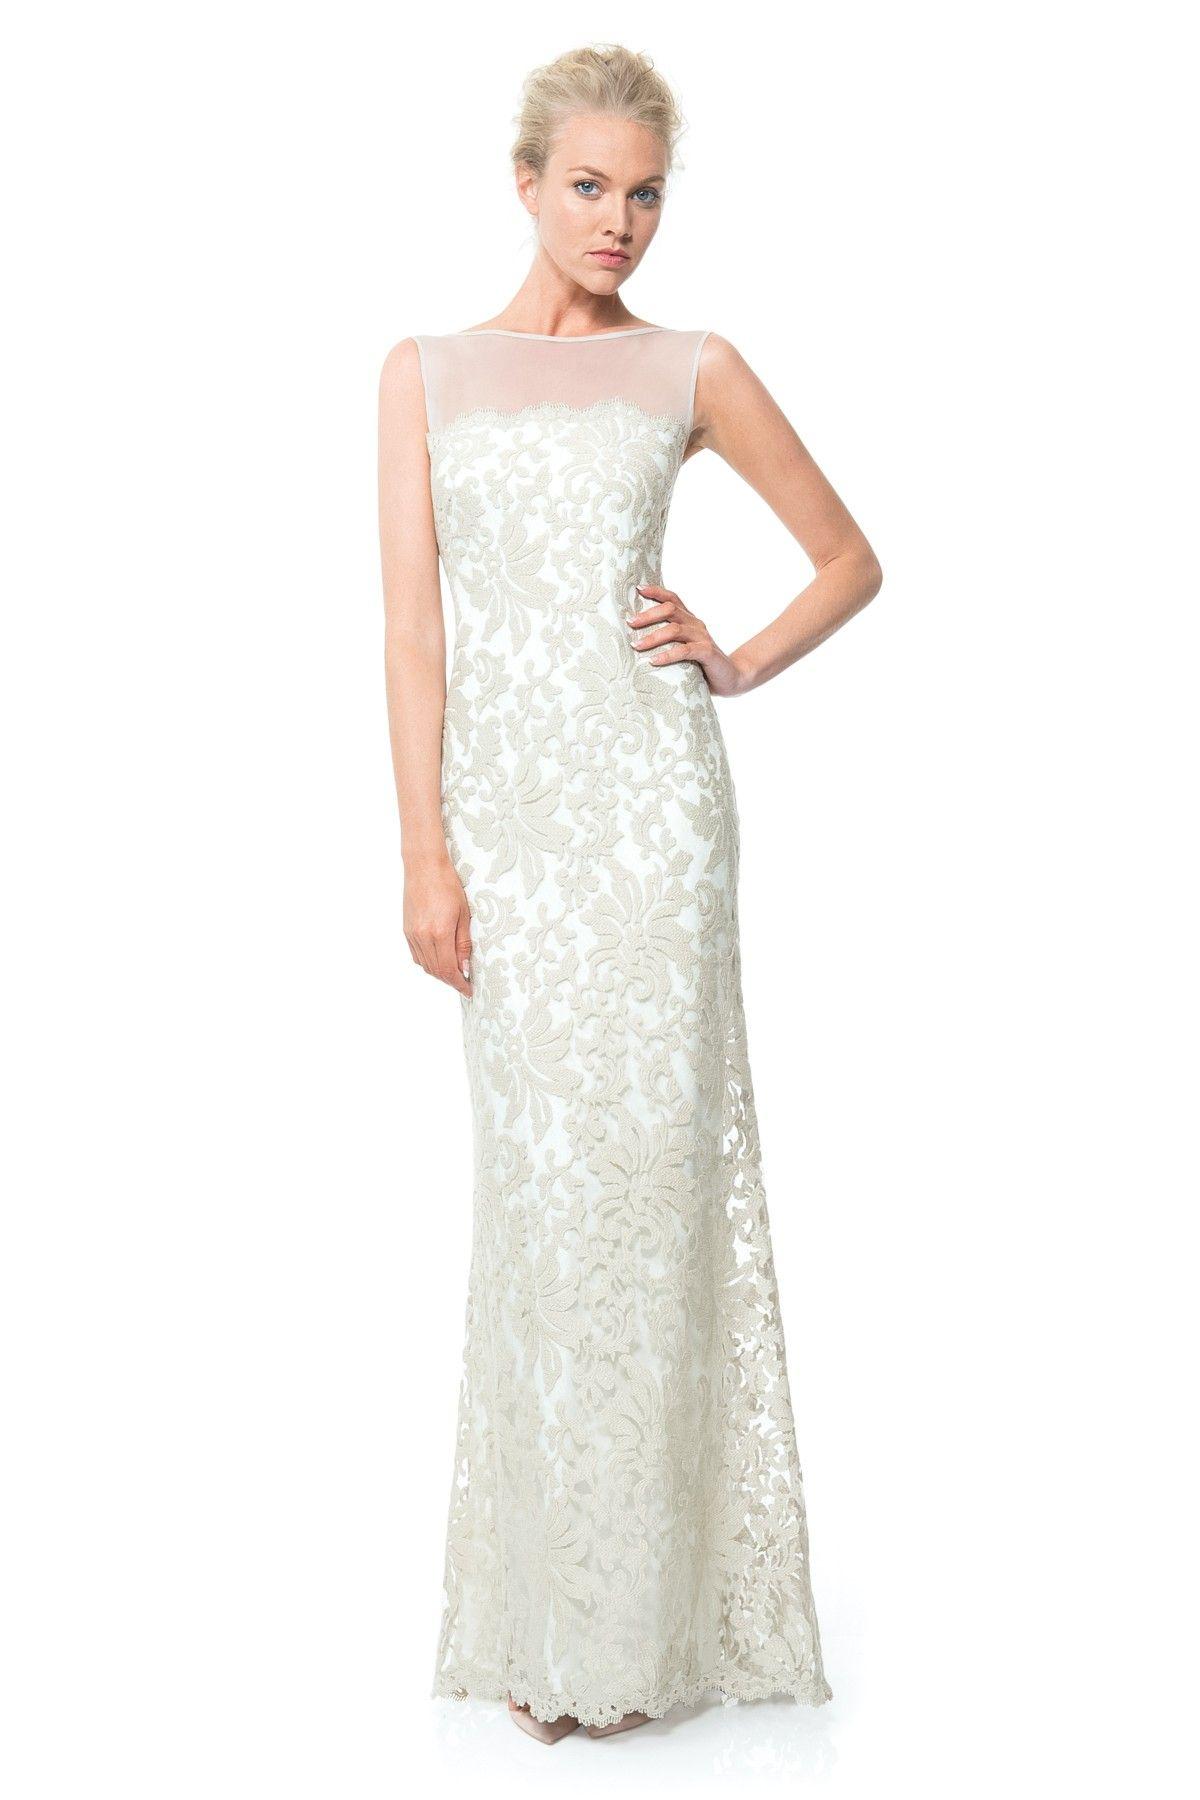 Sheer Illusion Lace Gown | Tadashi Shoji | The Dress | Pinterest ...